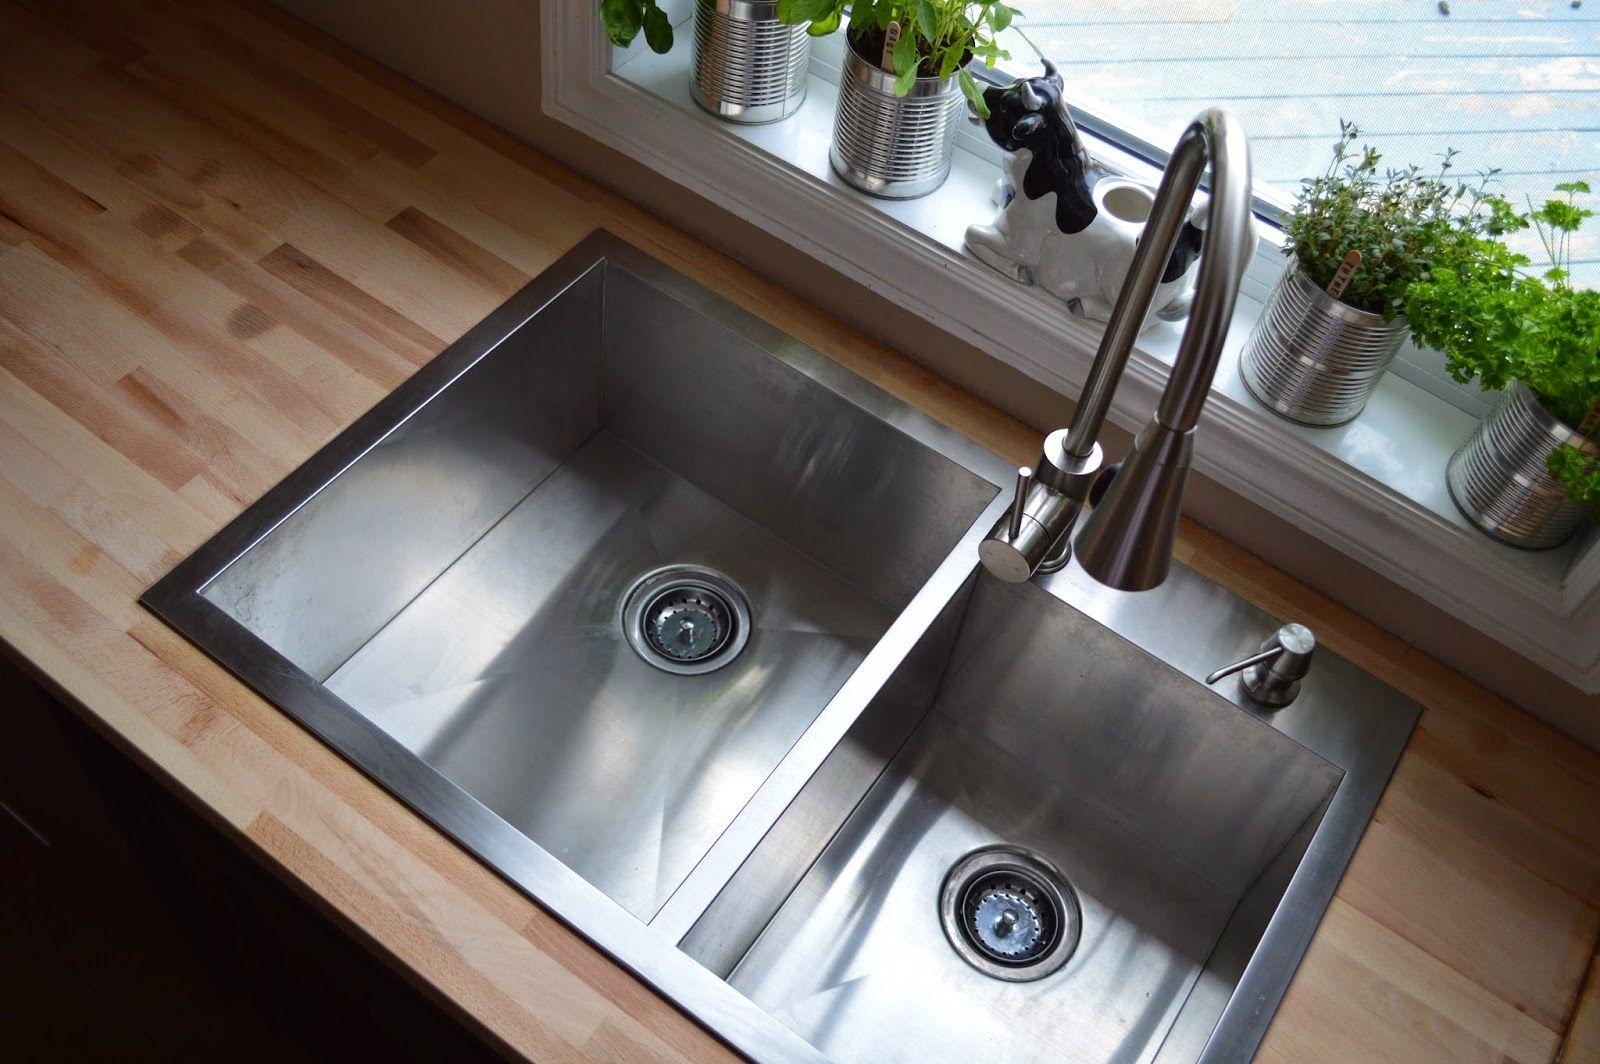 Kitchen with no window  kitchen renovation  life without lemons  home ideas  pinterest